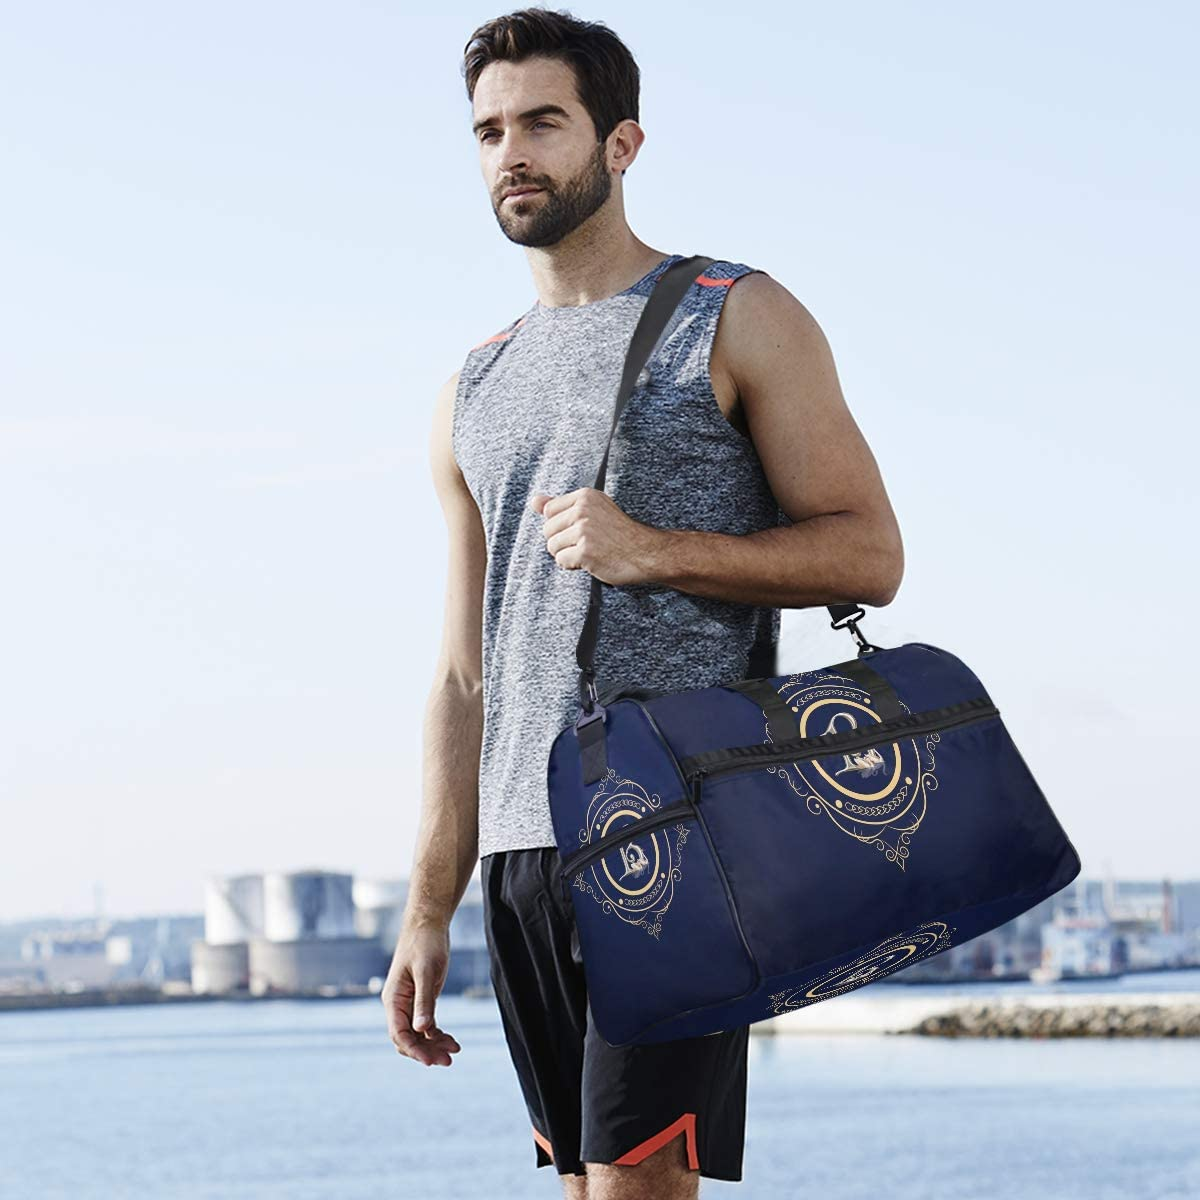 FANTAZIO Monogram B Sports Bag Packable Travel Duffle Bag Lightweight Water Resistant Tear Resistant